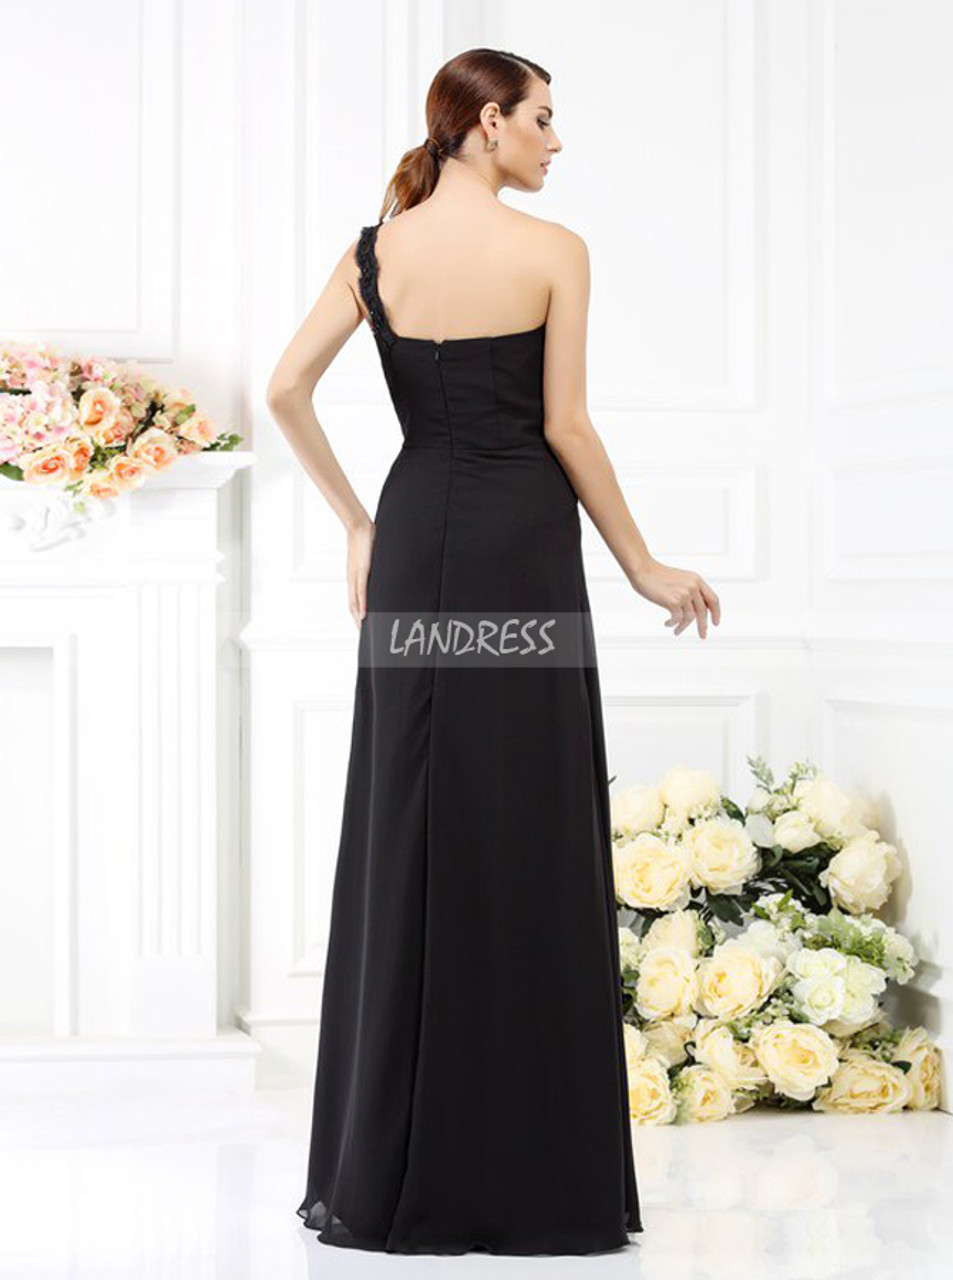 8c0e57f6566 ... One Shoulder Black Bridesmaid Dresses